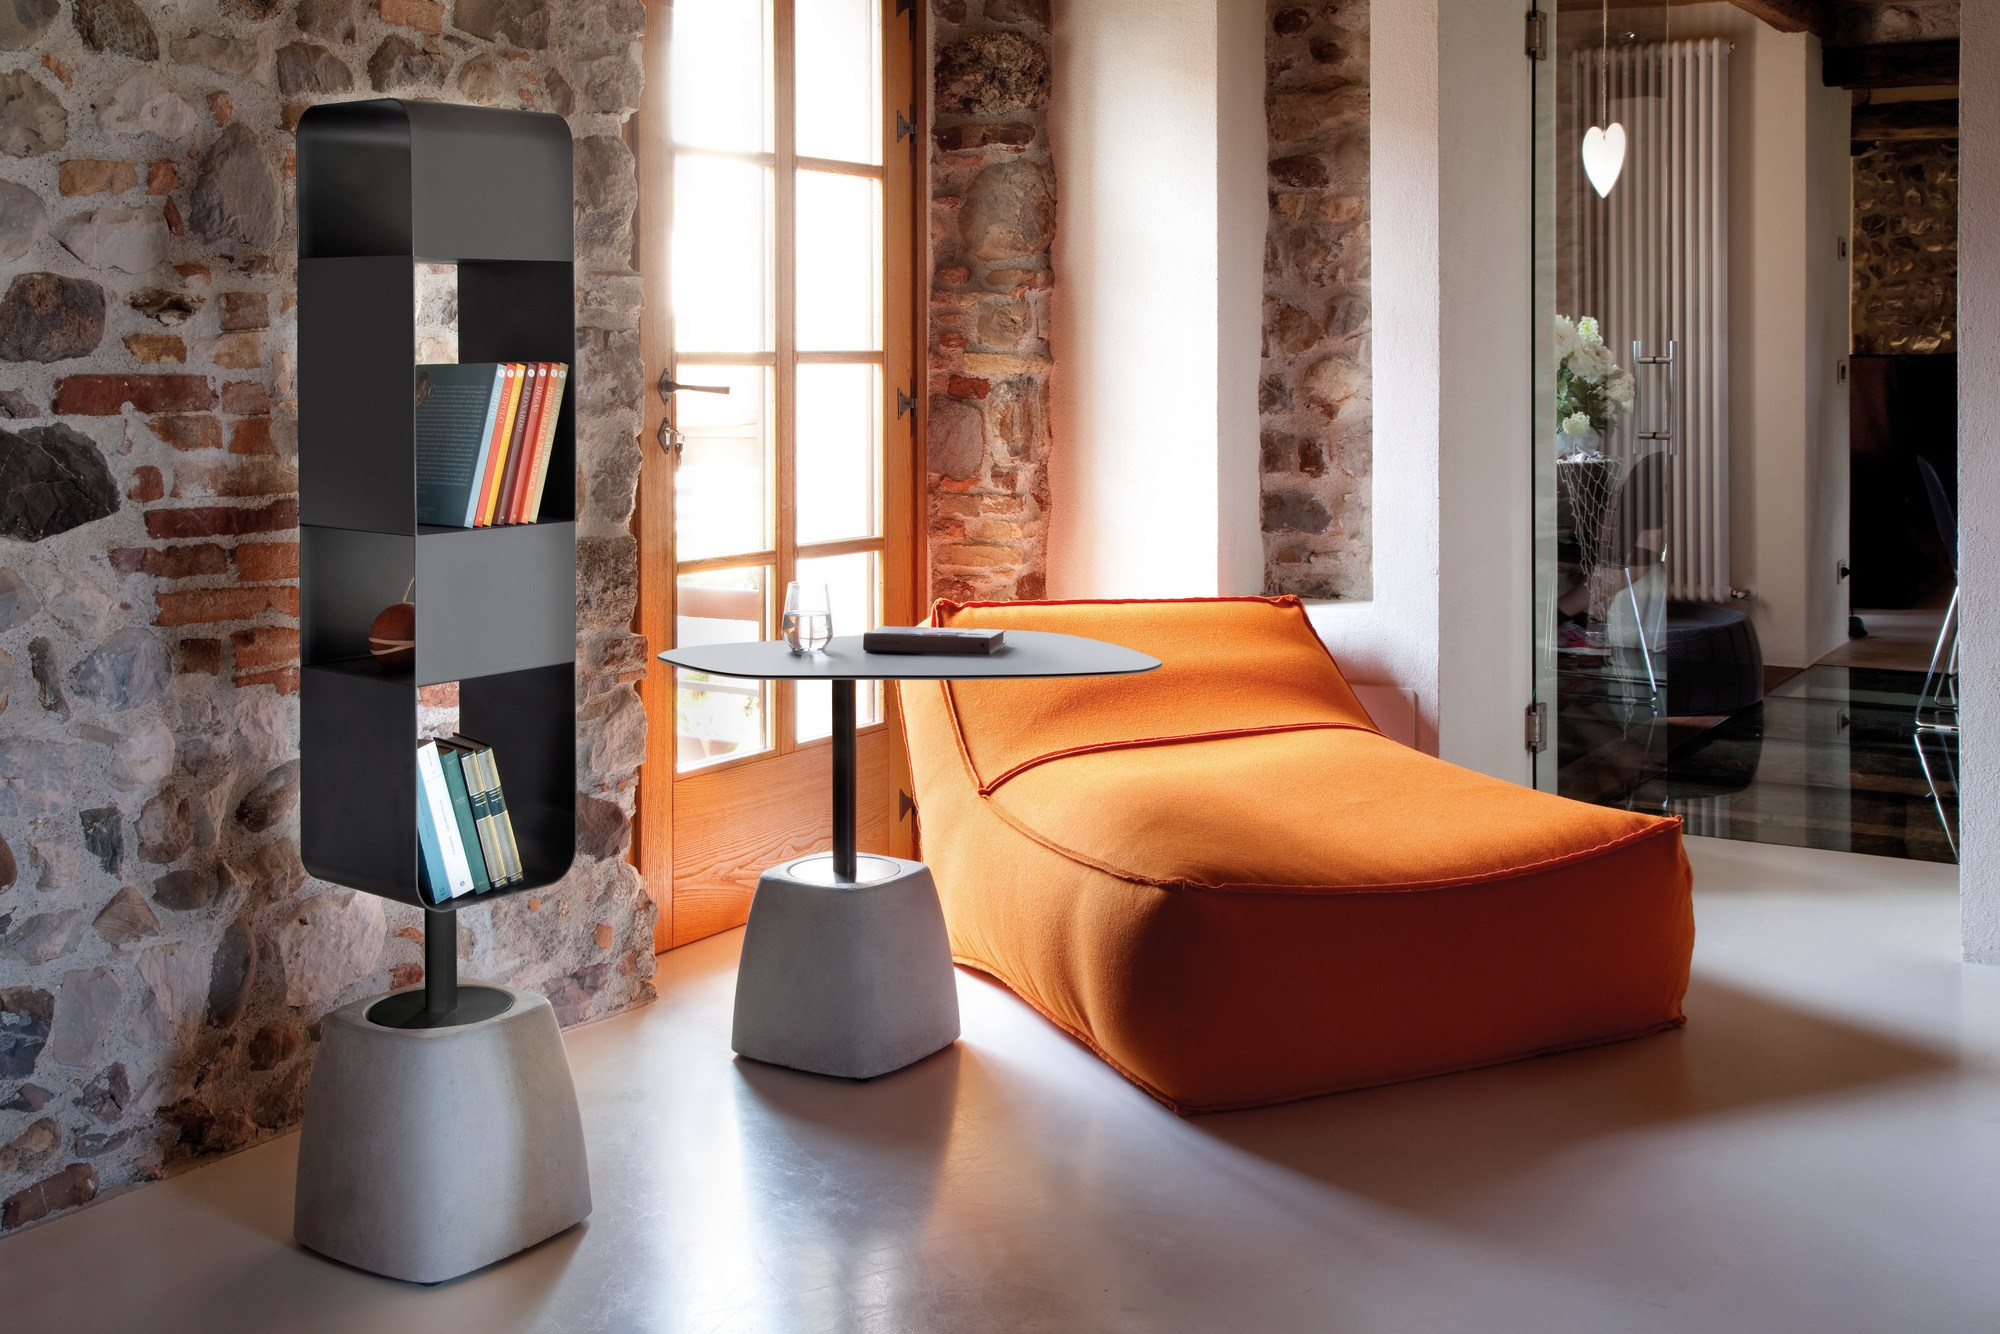 urban b libreria by domitalia design radice orlandini. Black Bedroom Furniture Sets. Home Design Ideas